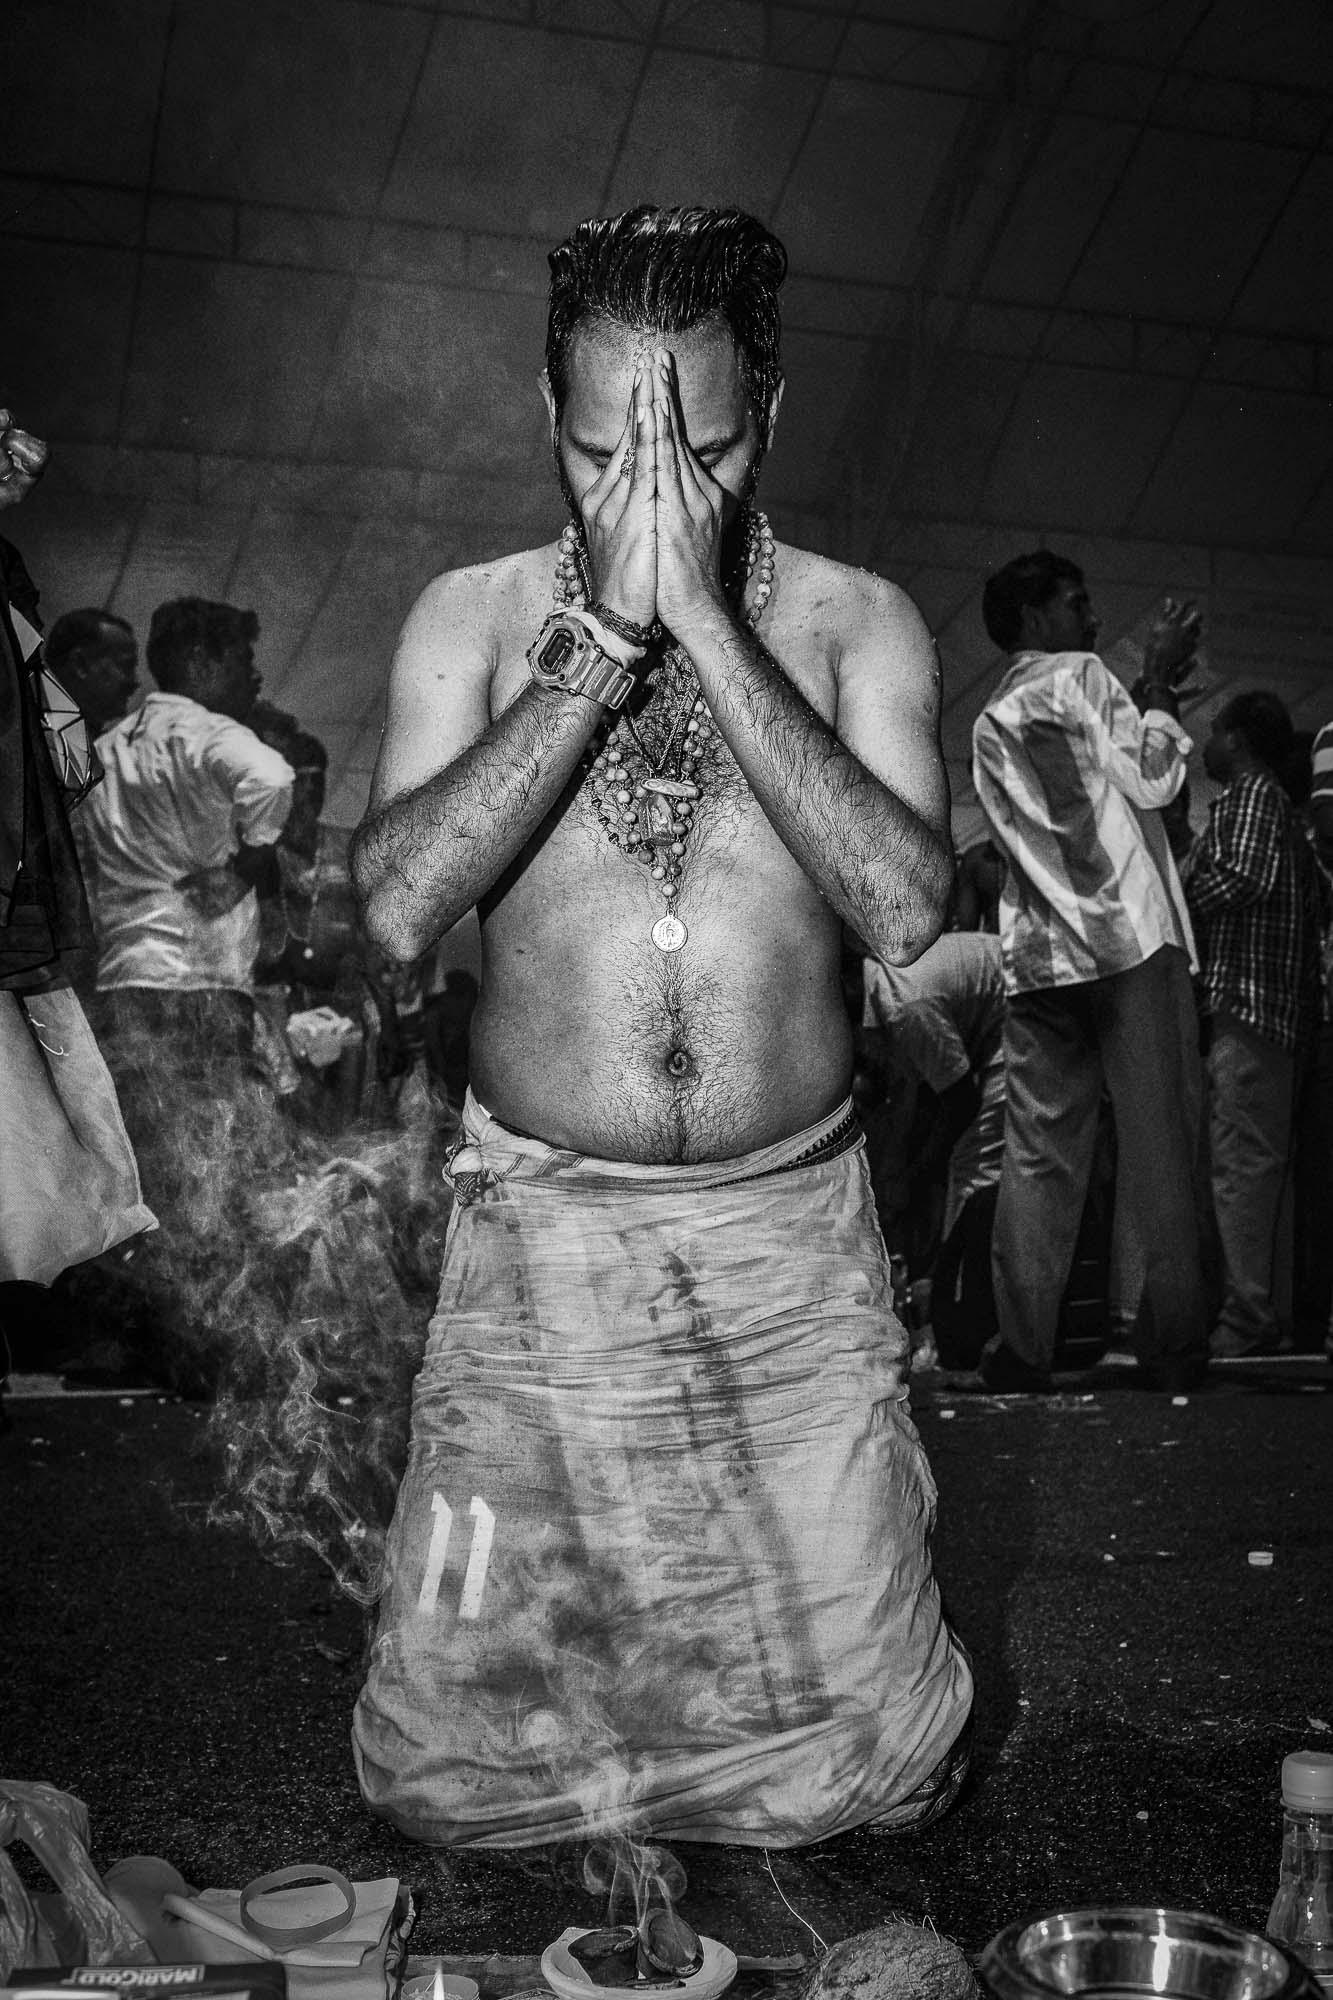 prayer indian man temple Little India Thaipusam Festival hindu Singapore photography jose jeuland documentary event